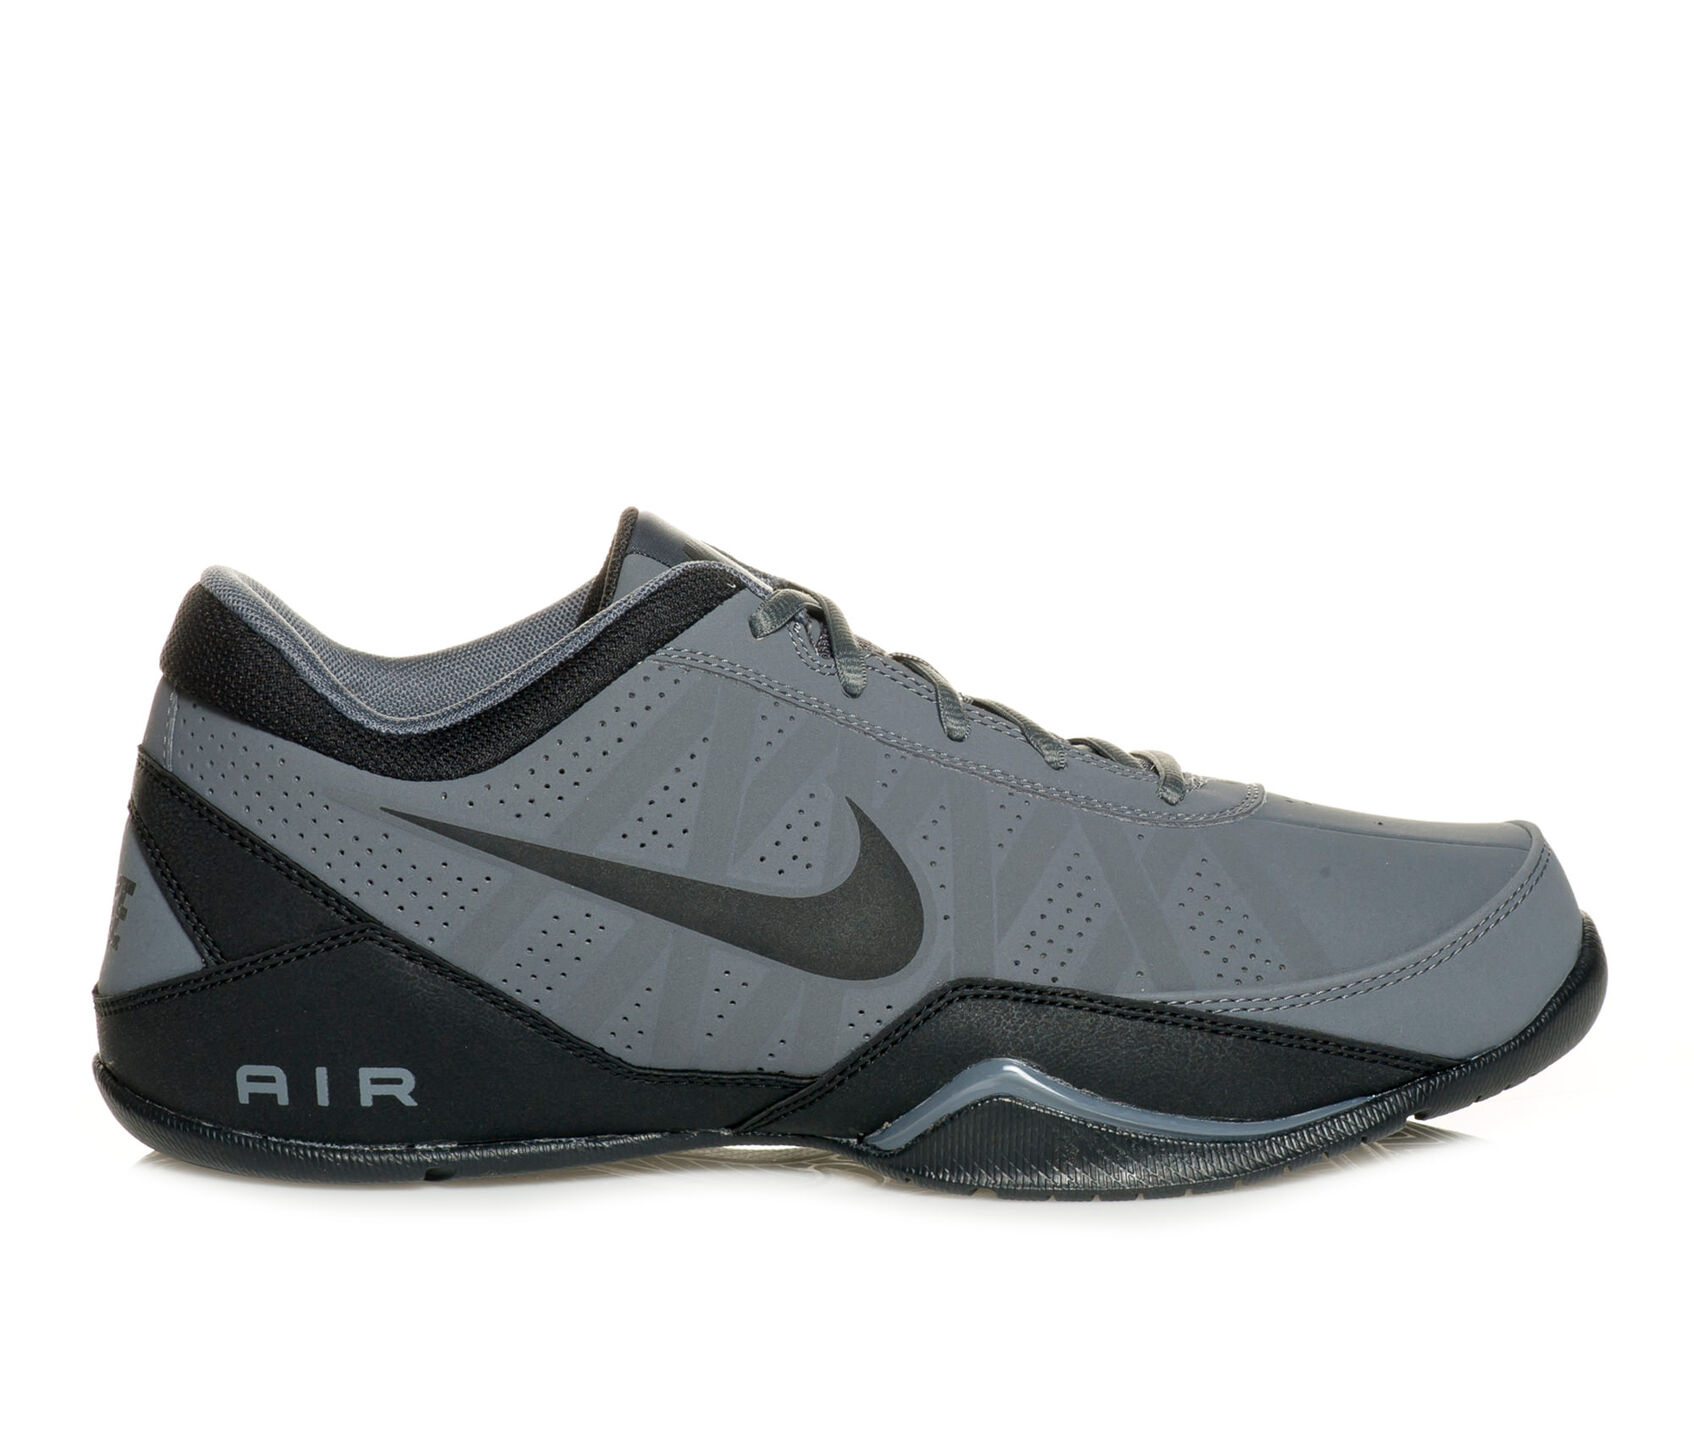 premium selection 6f9fe edbd2 ... Nike Air Ring Leader Low Basketball Shoes. Previous